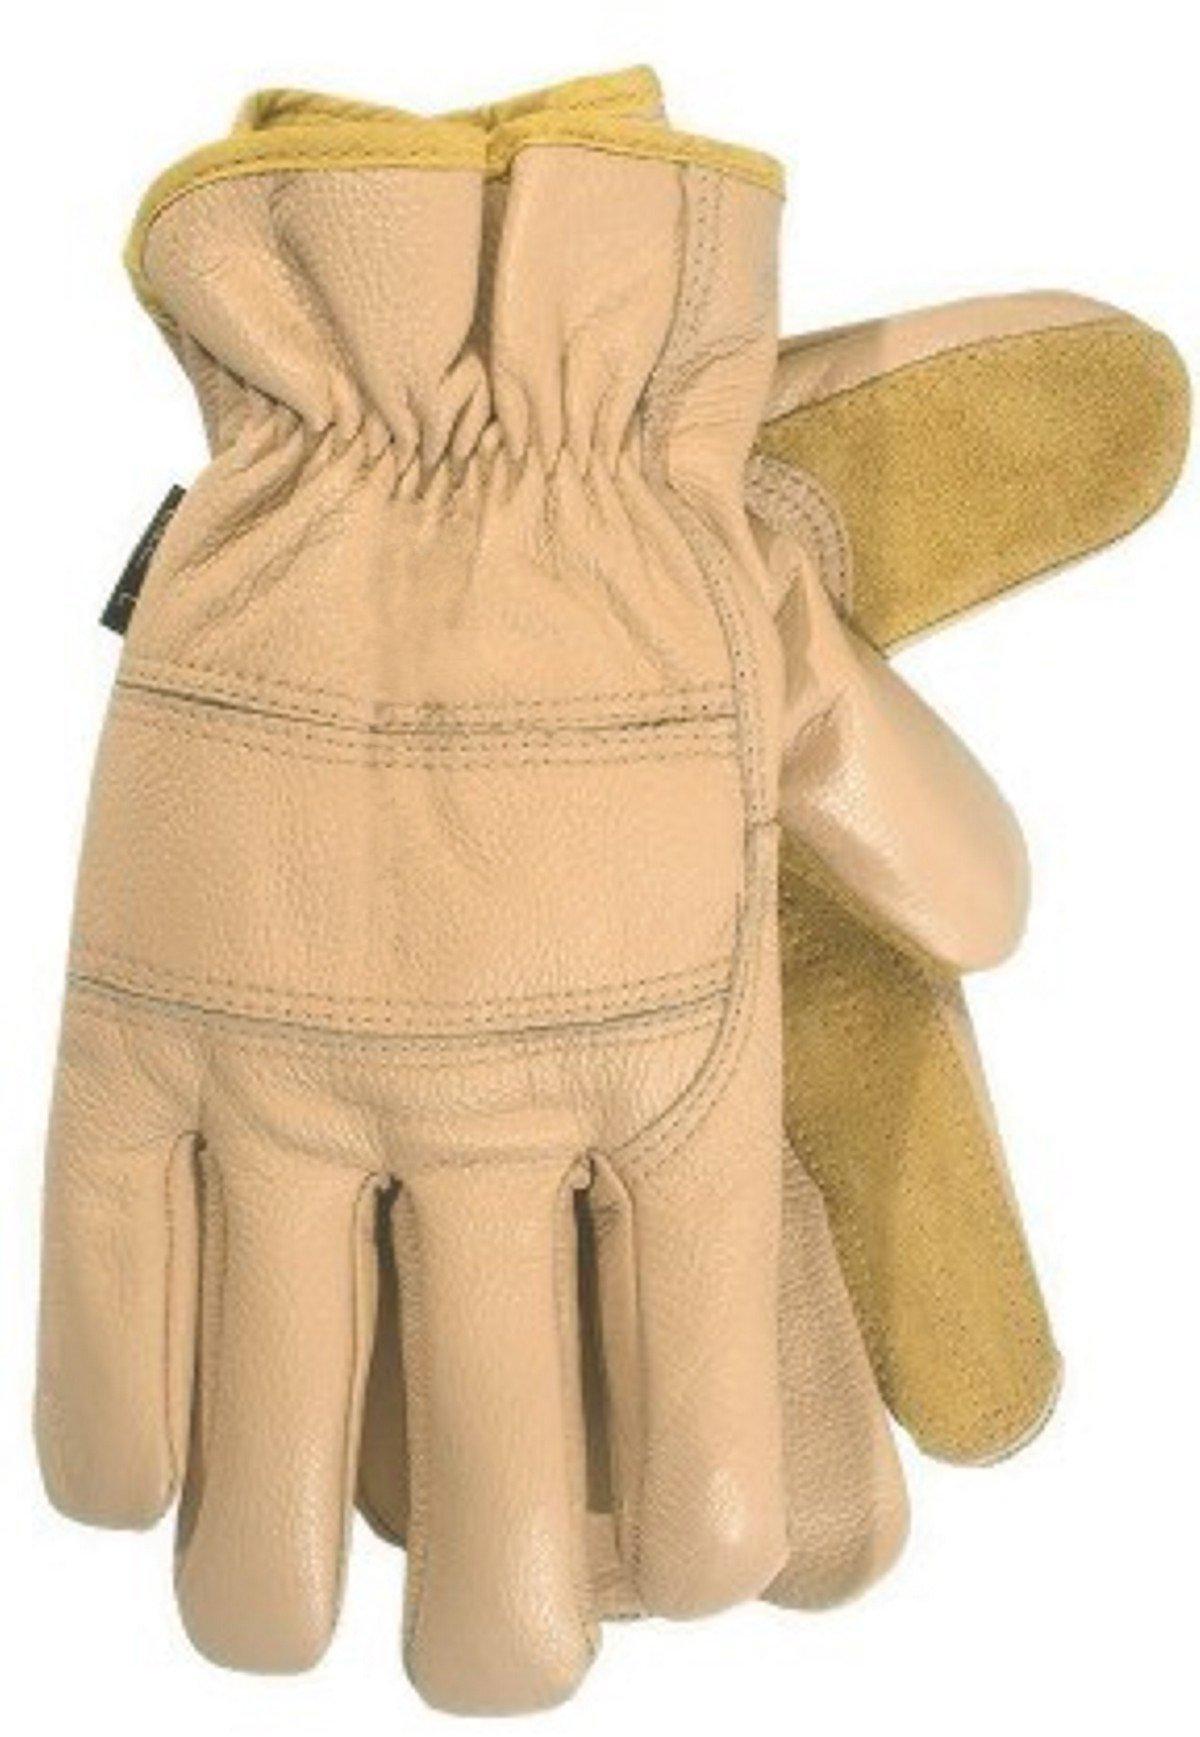 Carolina Gloves Summer Desert Moisture Resistant Cold Weather Leather Glove, Large